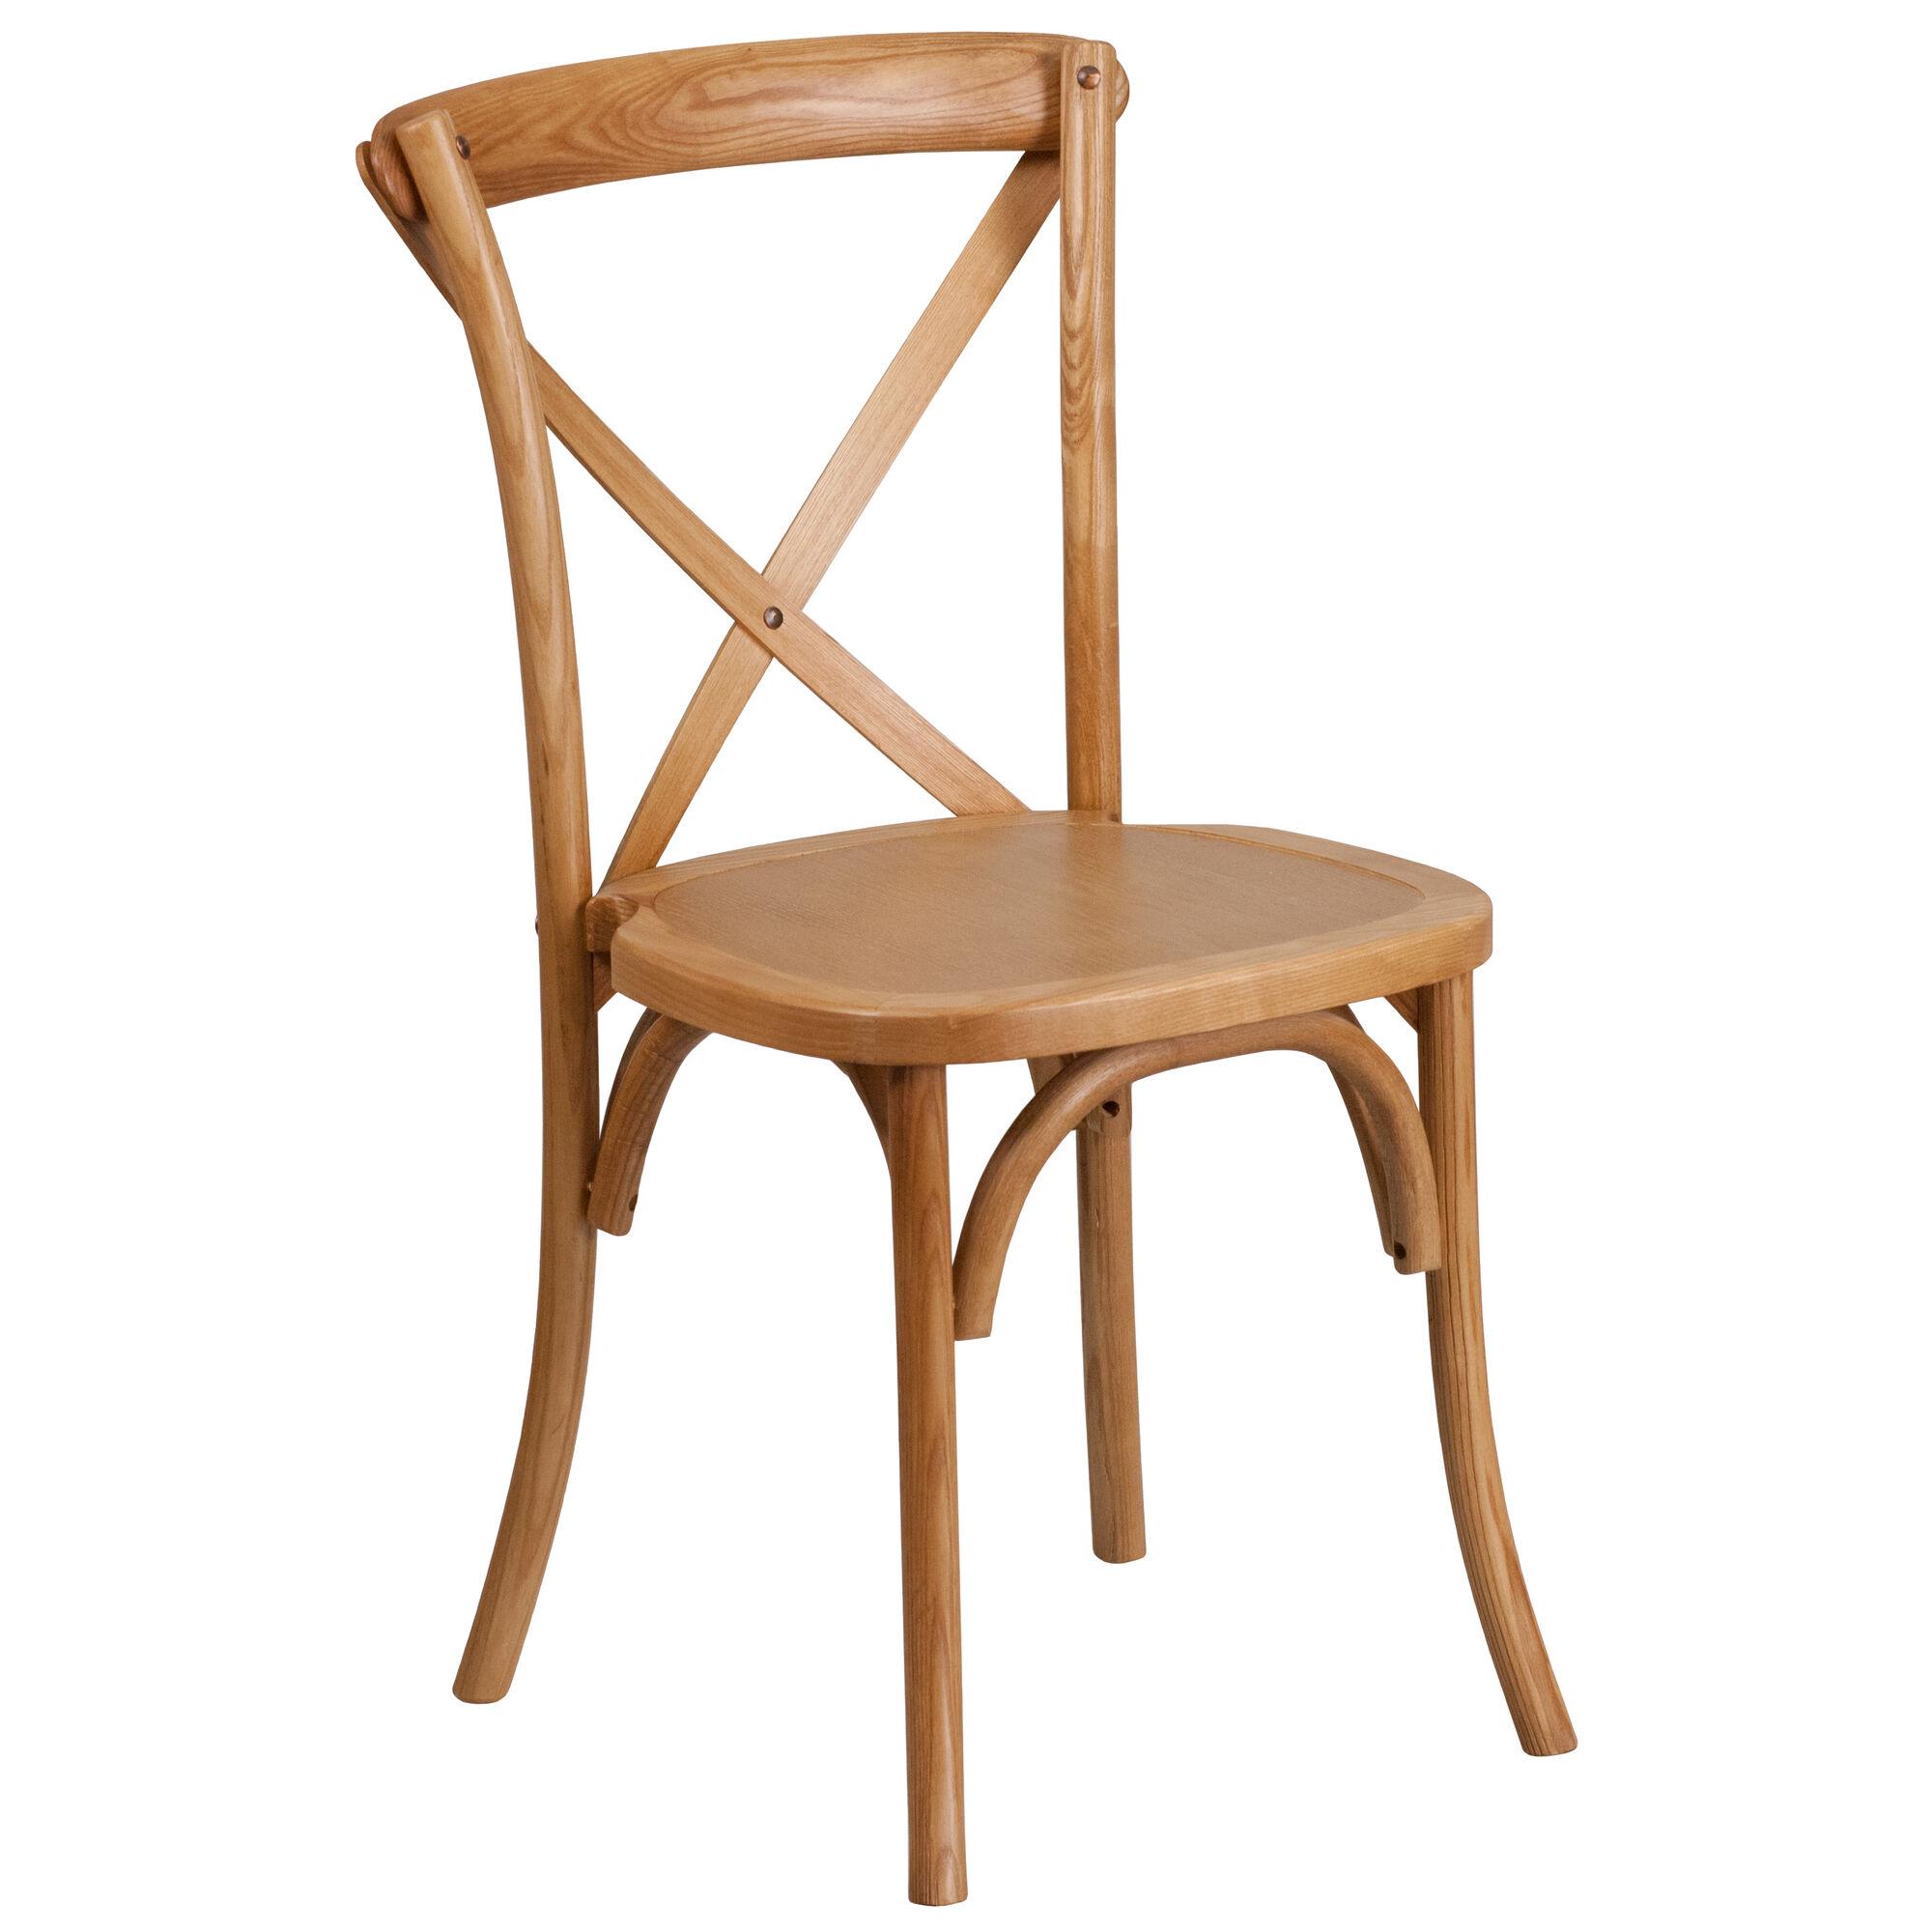 Preferred RestaurantFurniture4Less: Cross Back Chairs RJ05